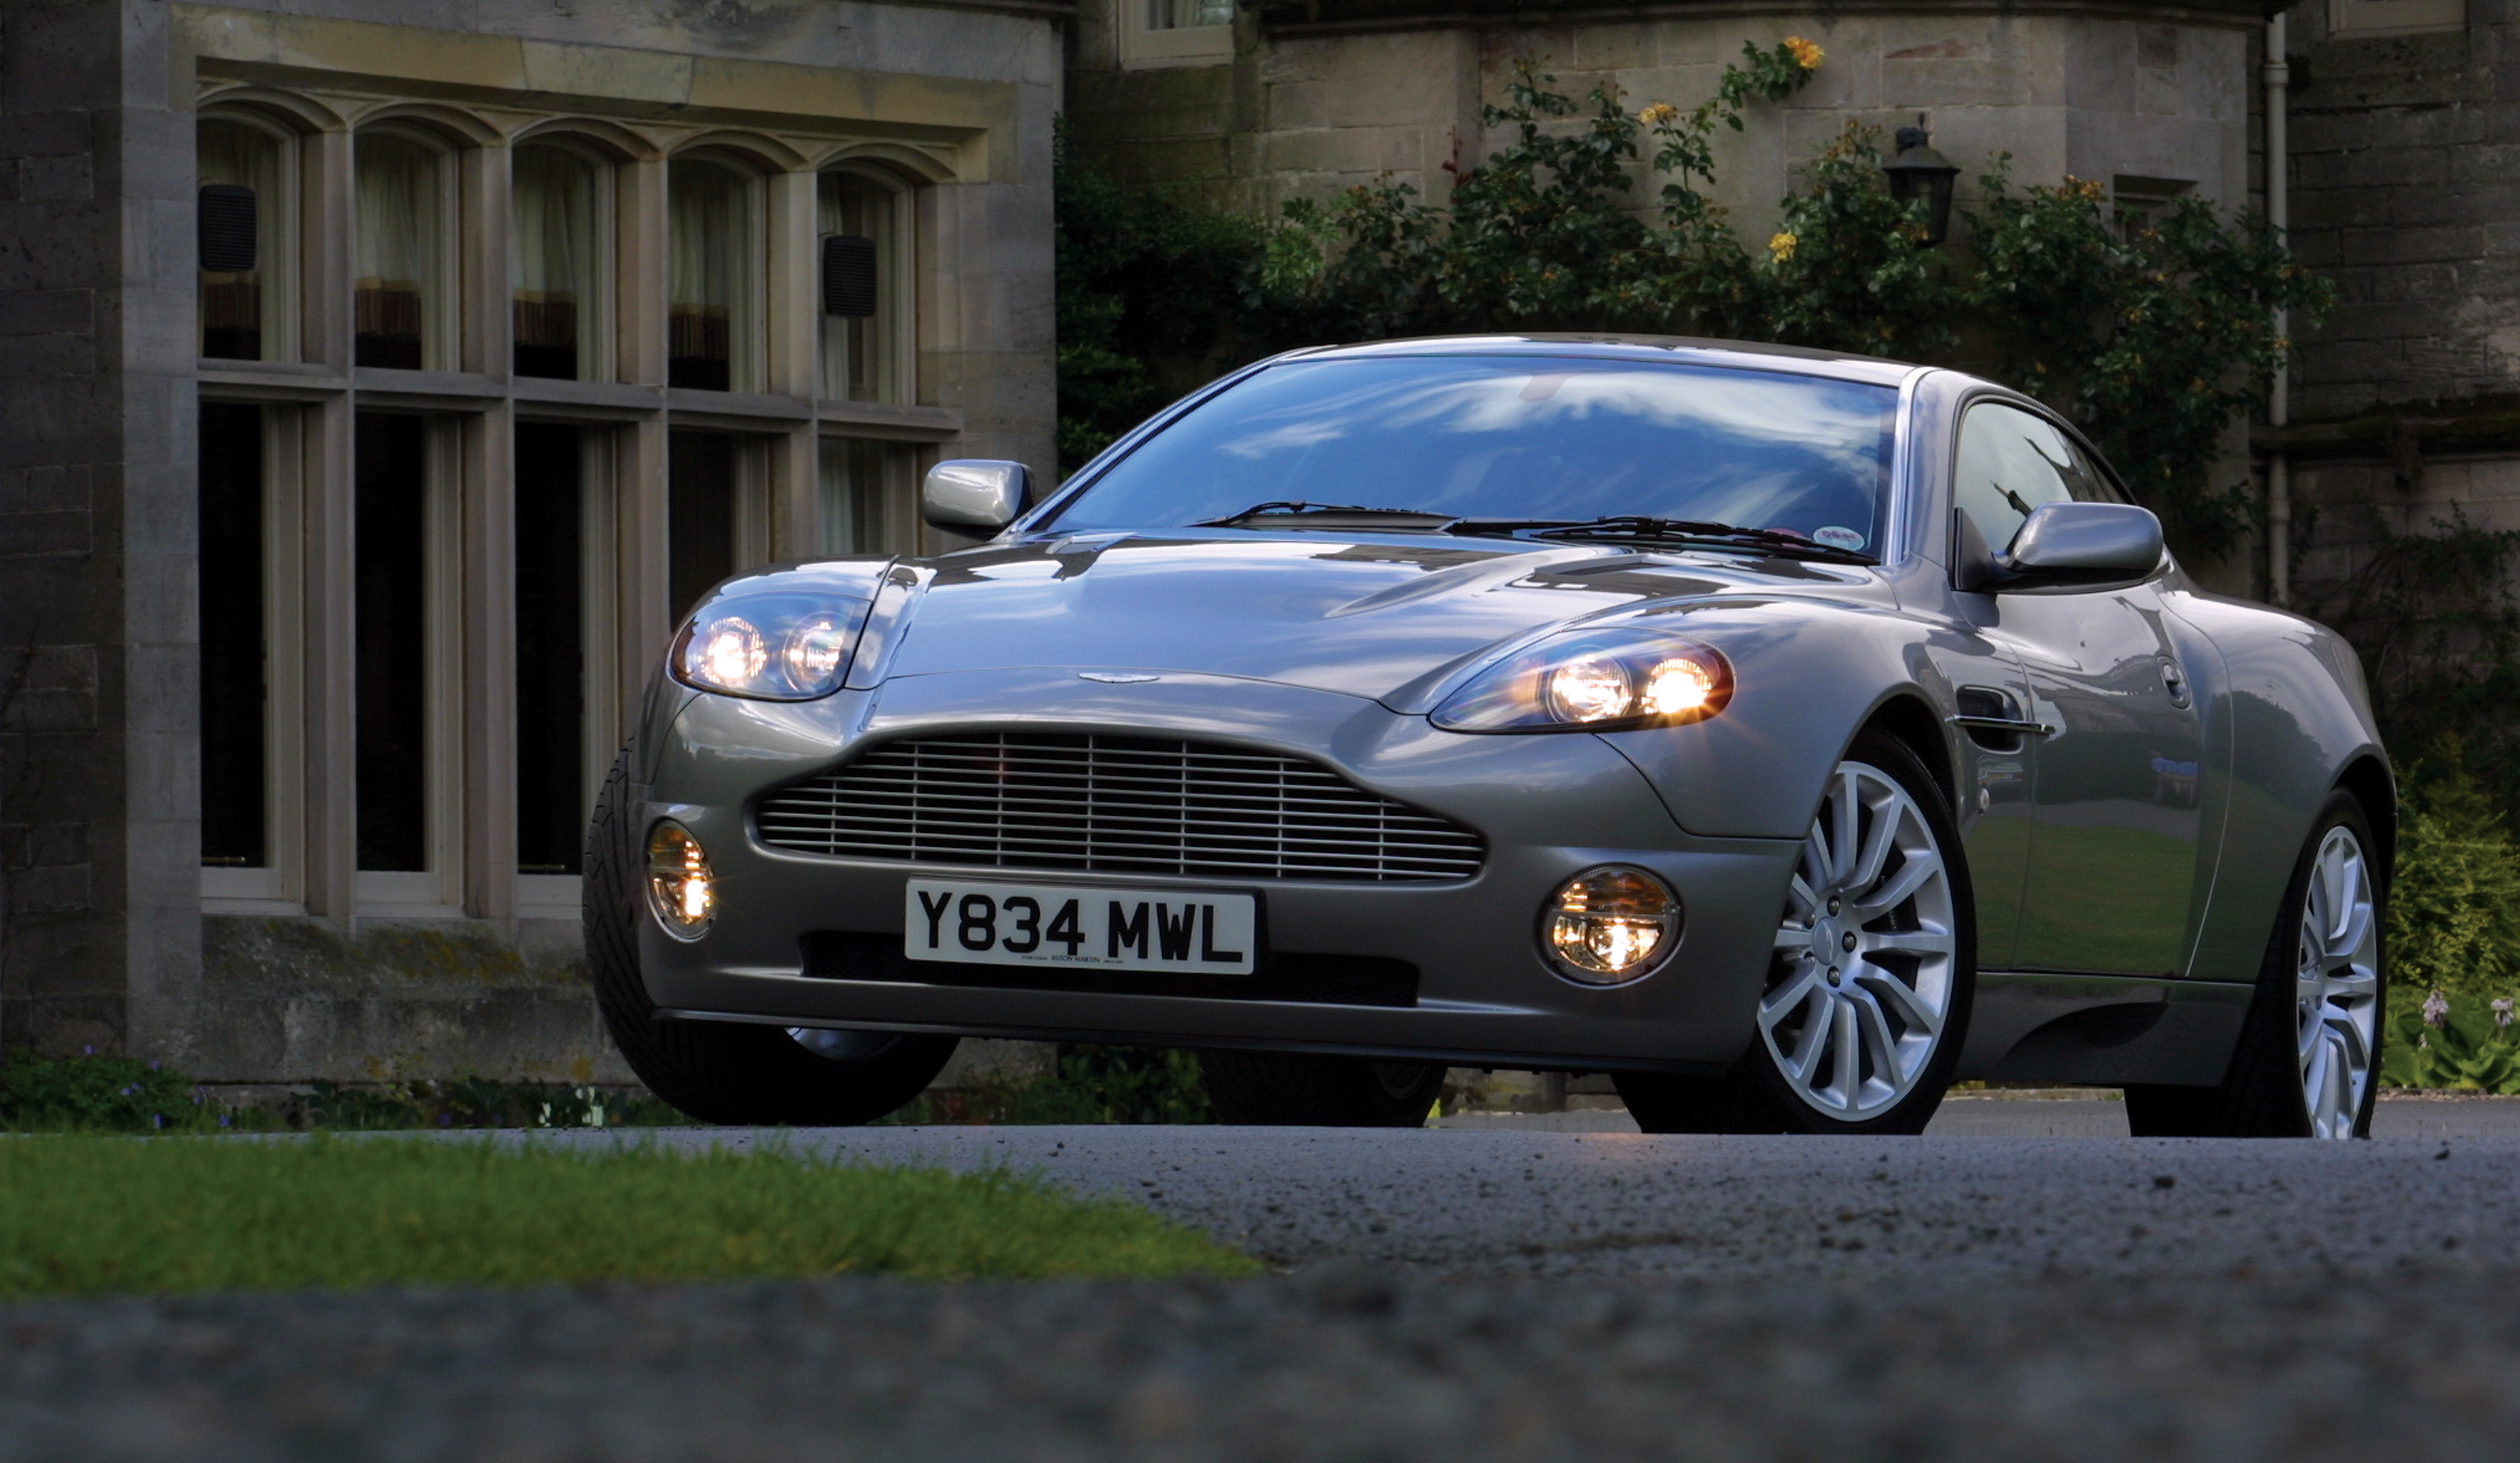 Samochody Aston Martin – Katalog aut Auto Świat